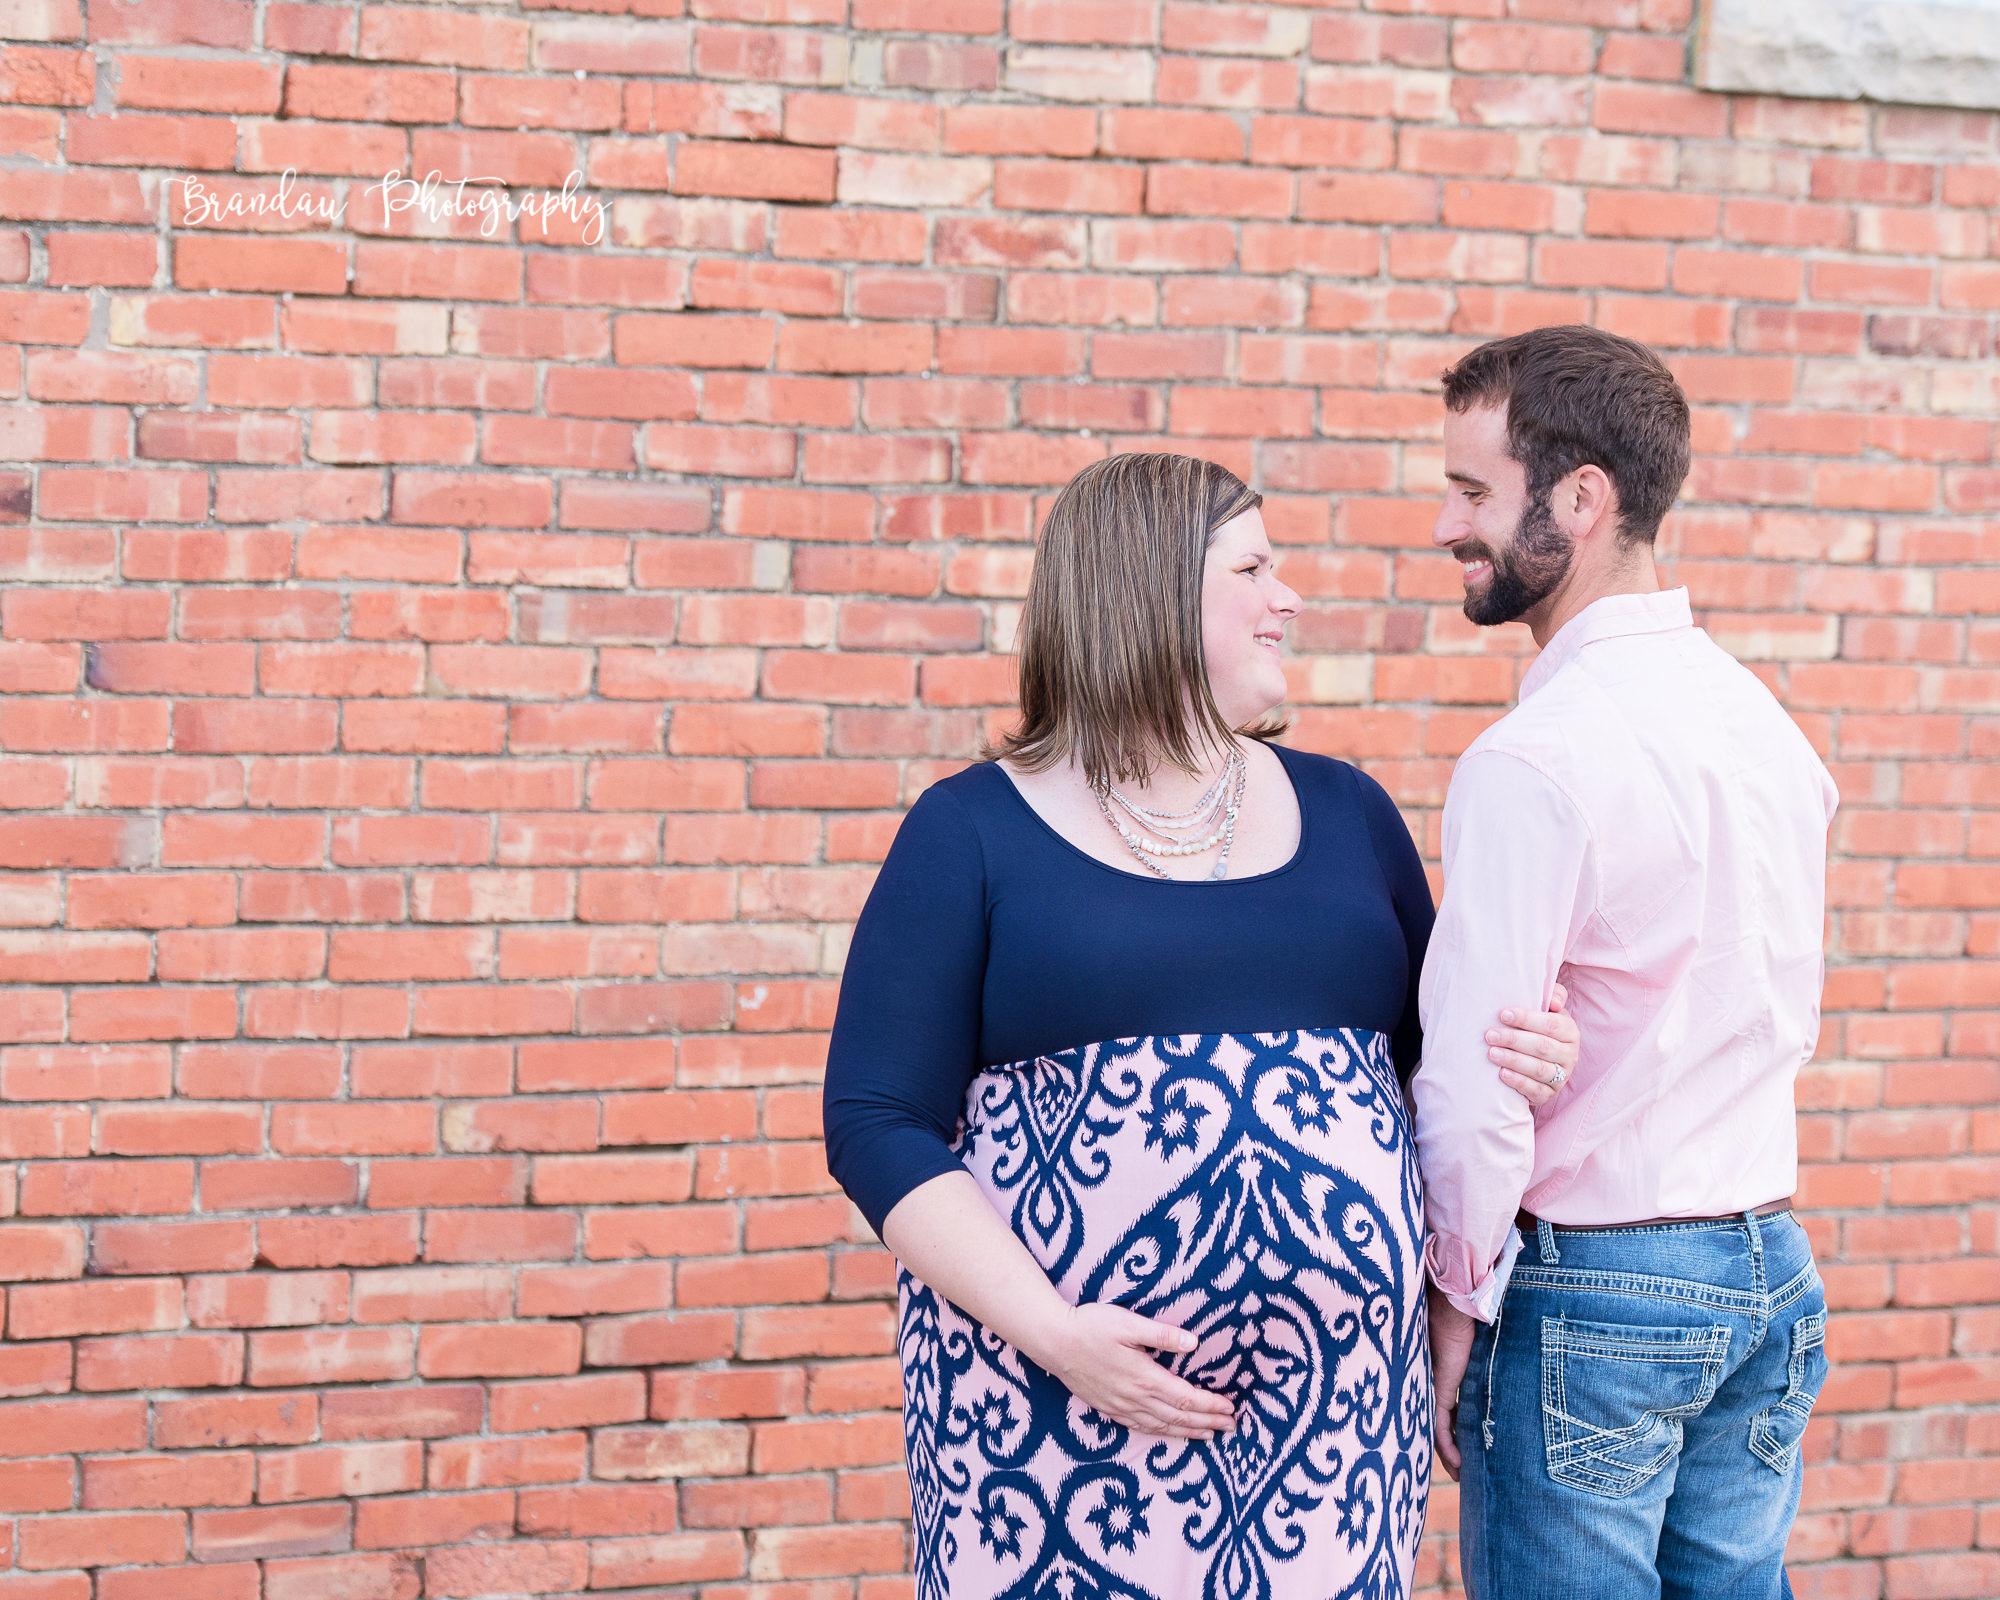 Engagement Iowa Maternity_Brandau Photography-33.jpg